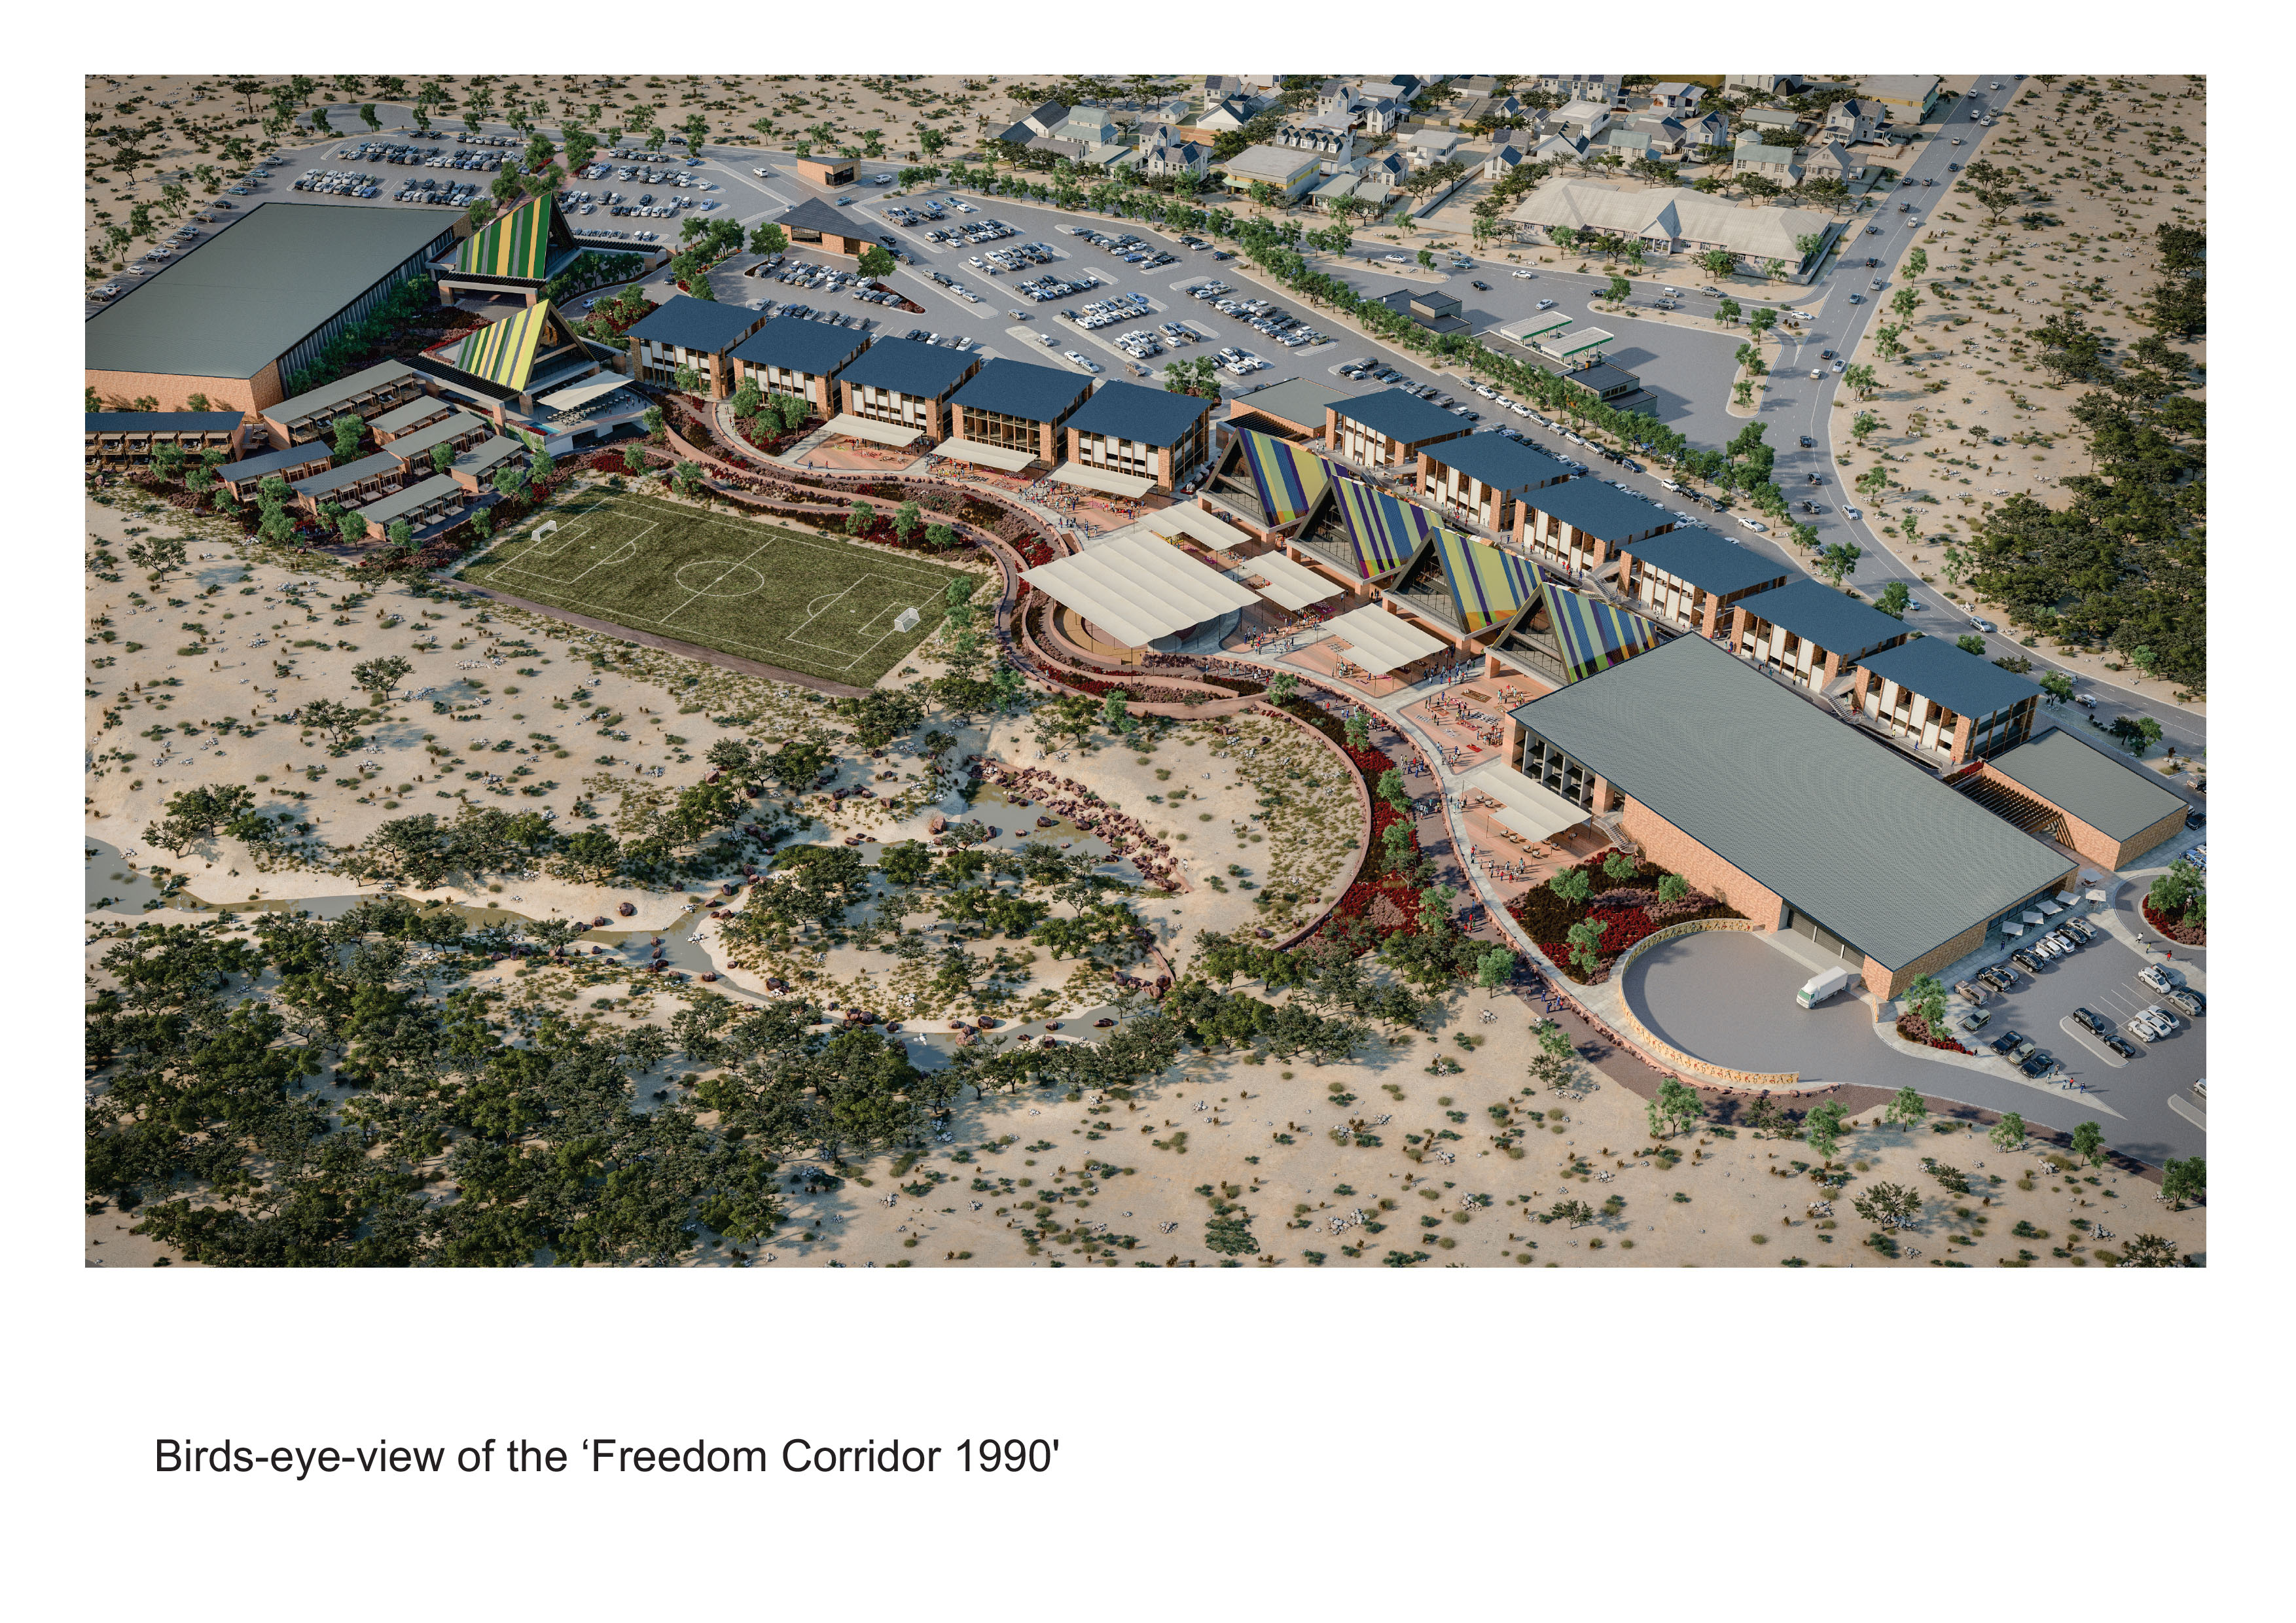 freedom corridor birds eye view